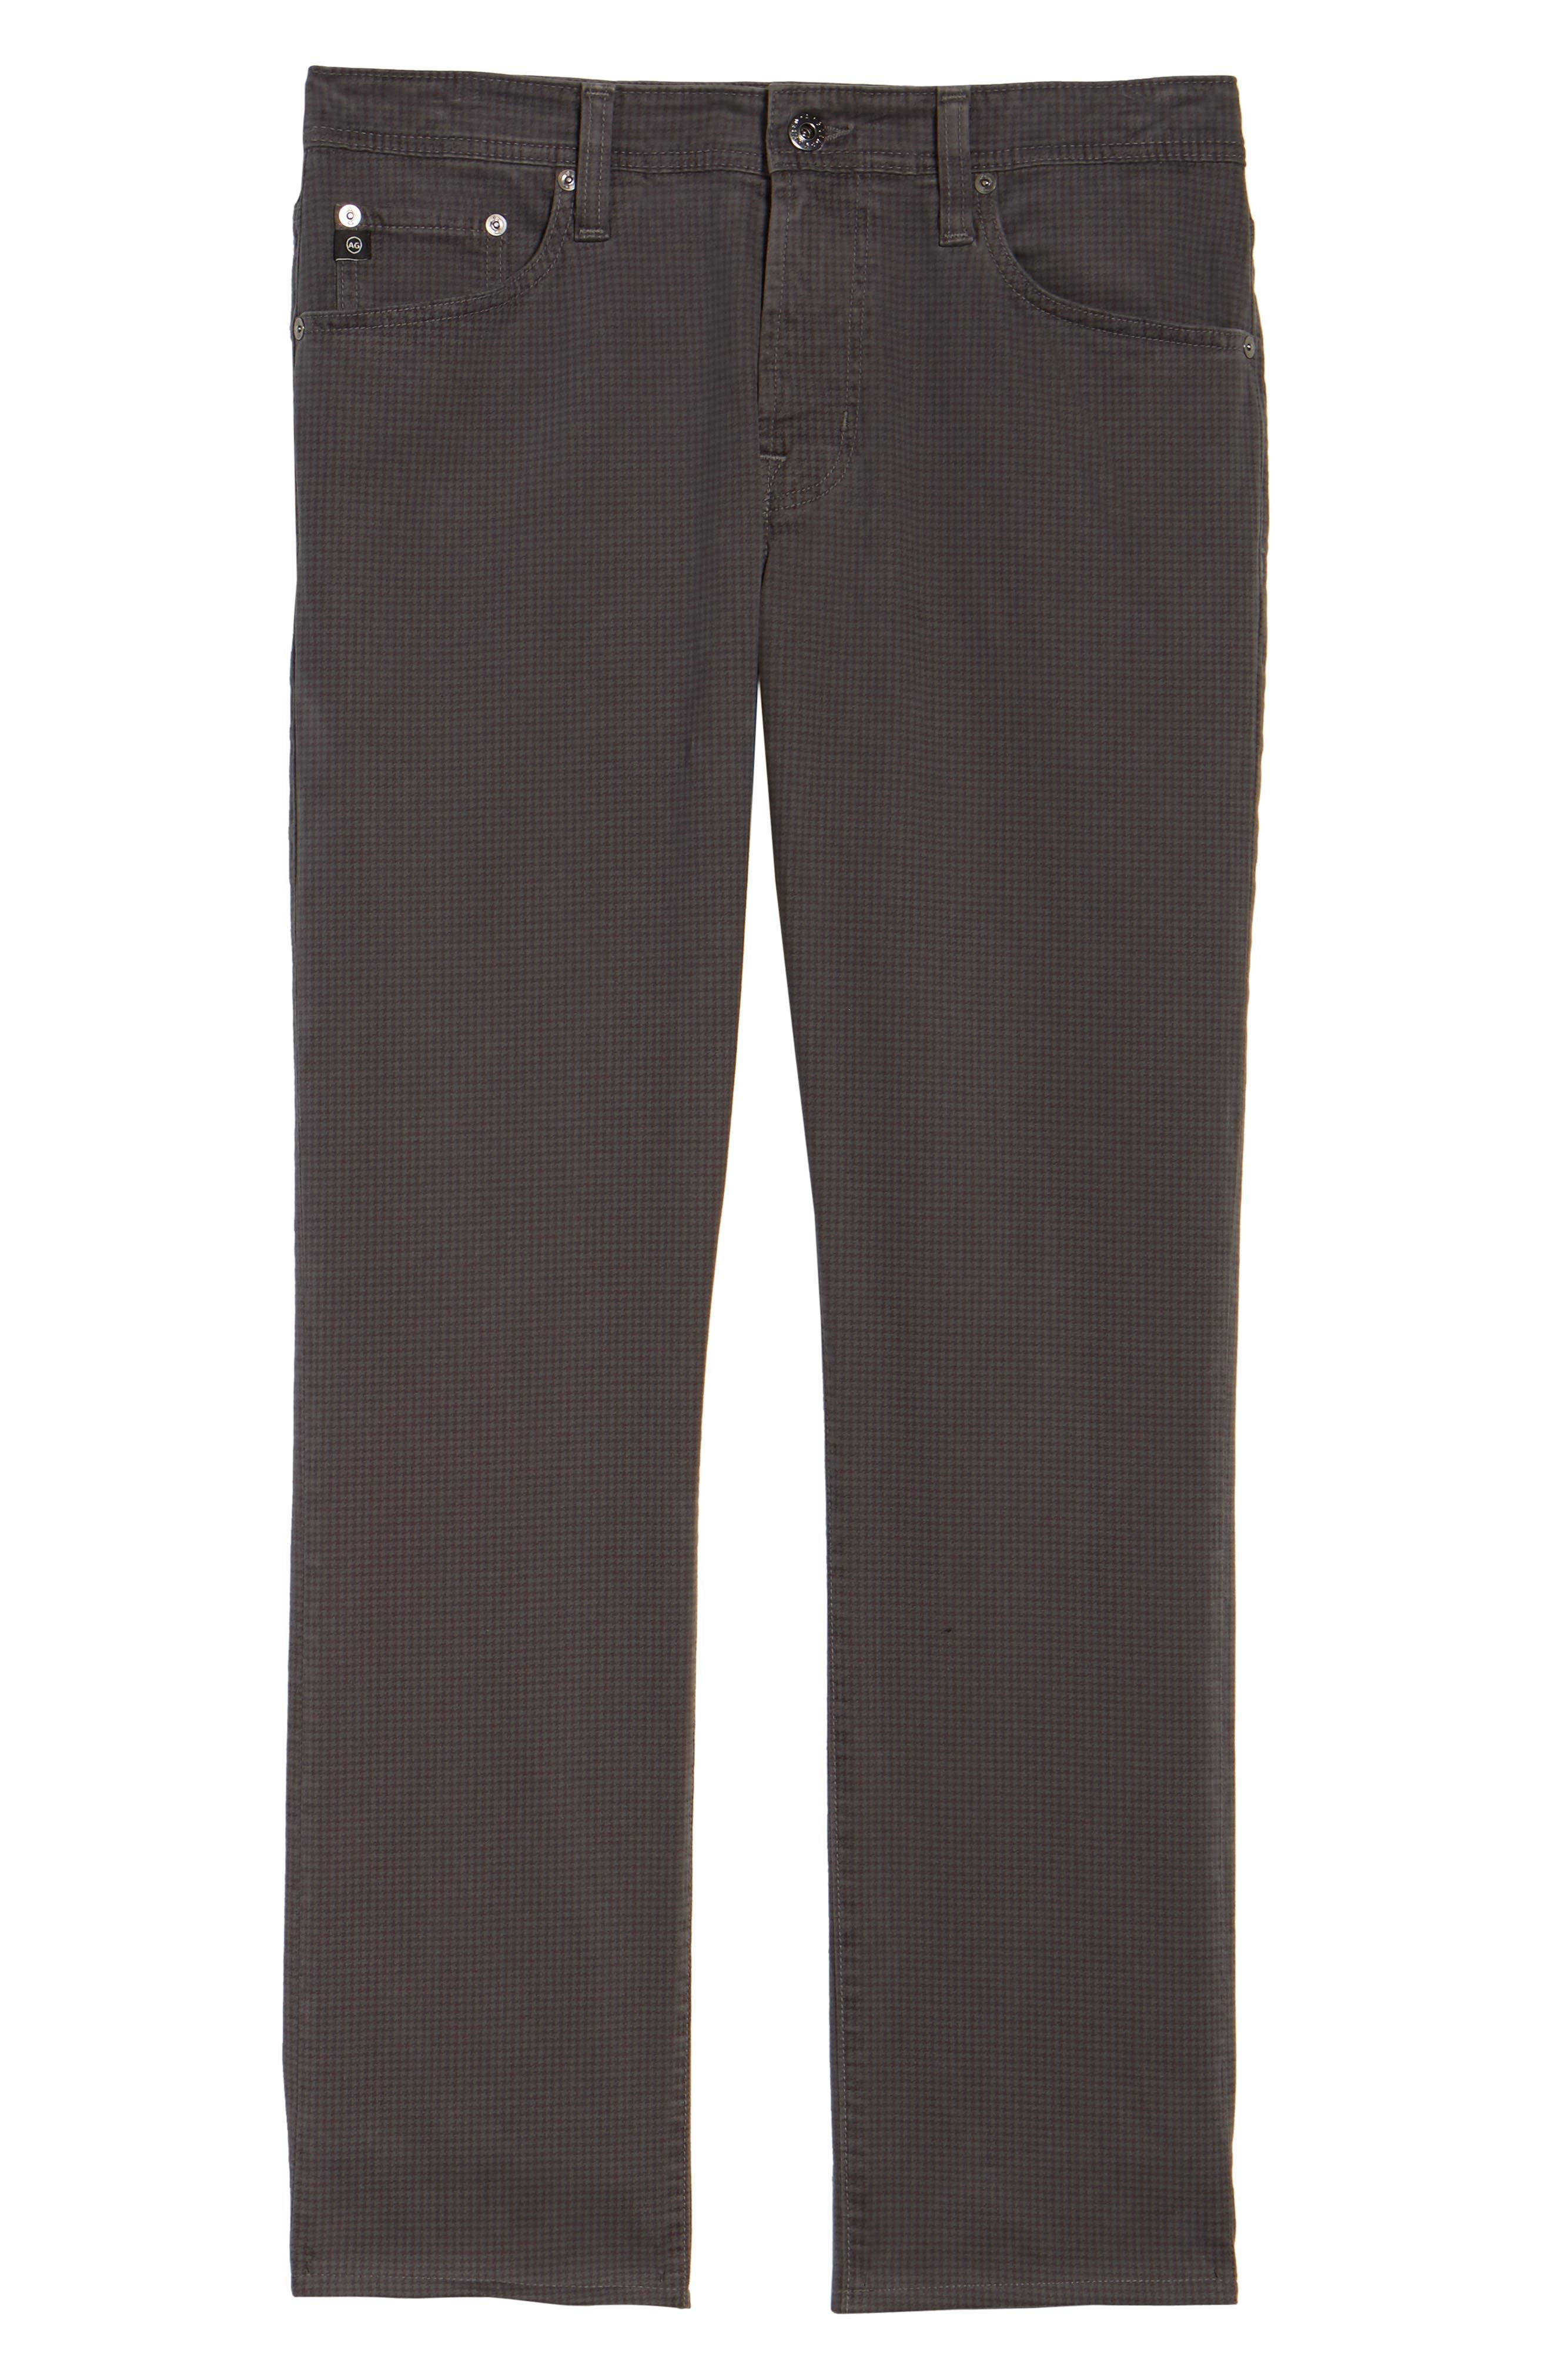 AG, Everett SUD Print Slim Straight Leg Pants, Alternate thumbnail 7, color, NO_COLOR